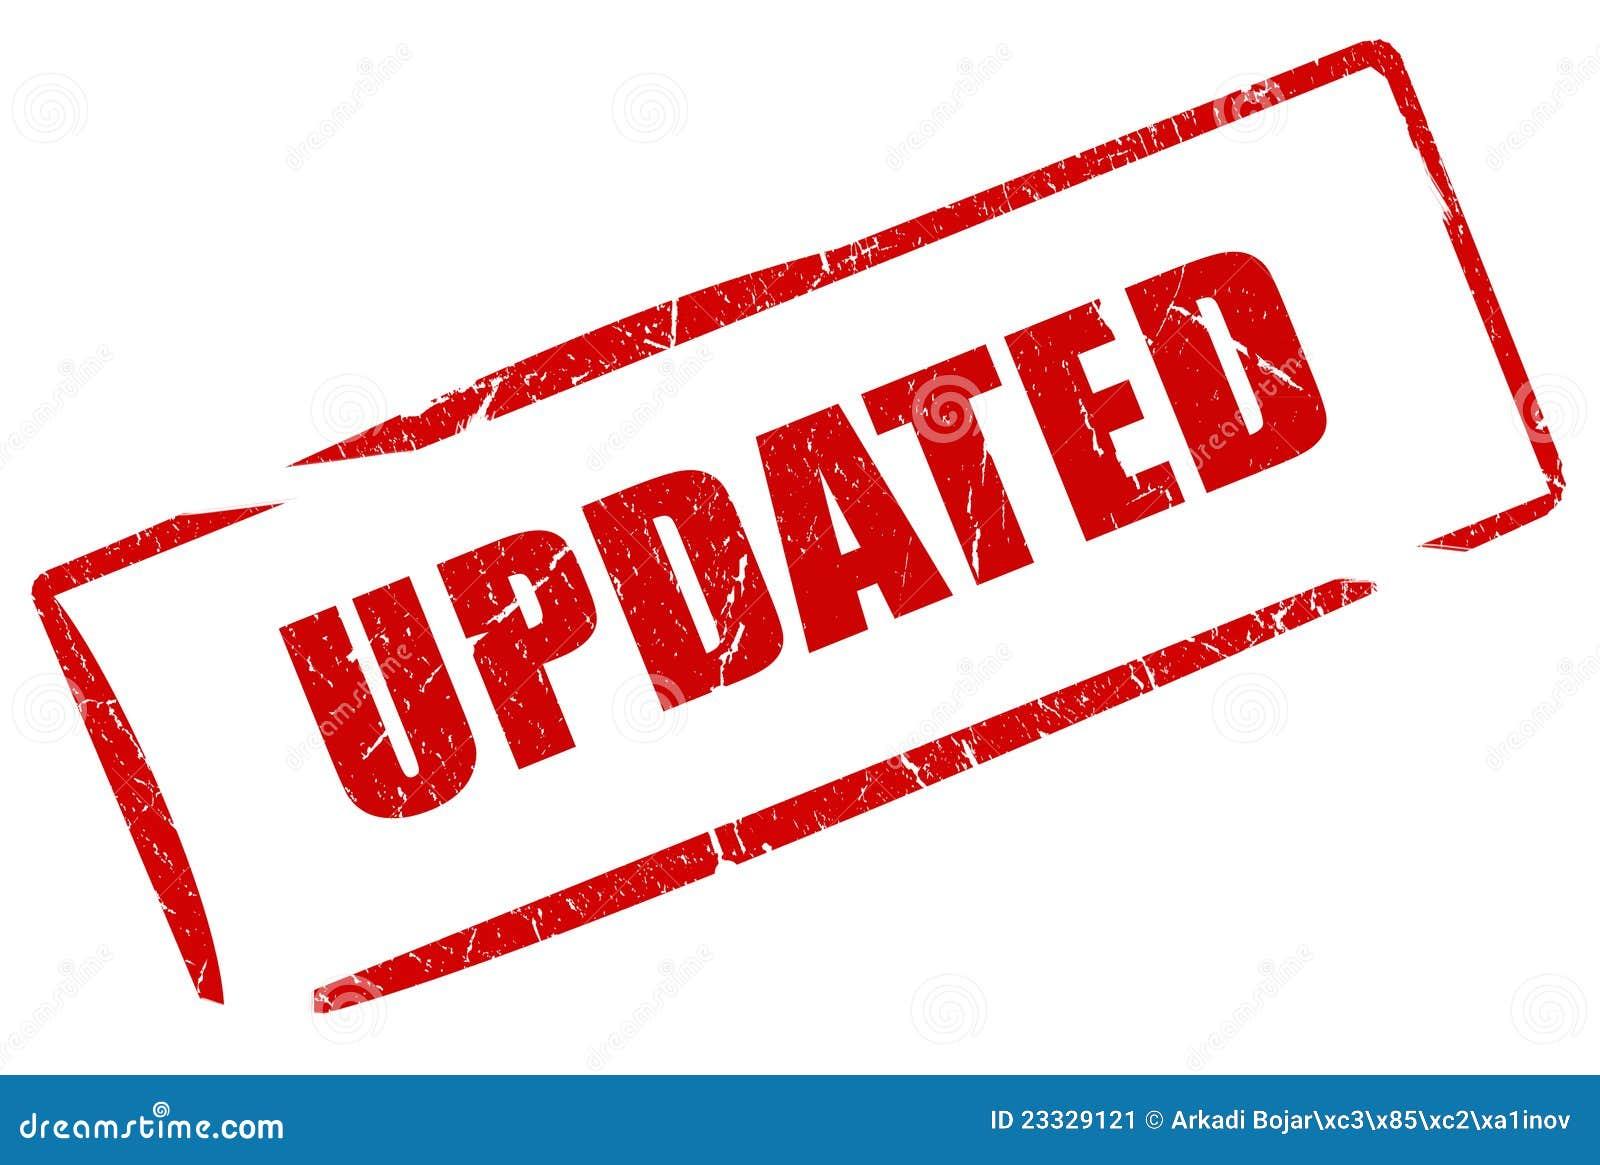 updated stamp stock illustration illustration of update 23329121